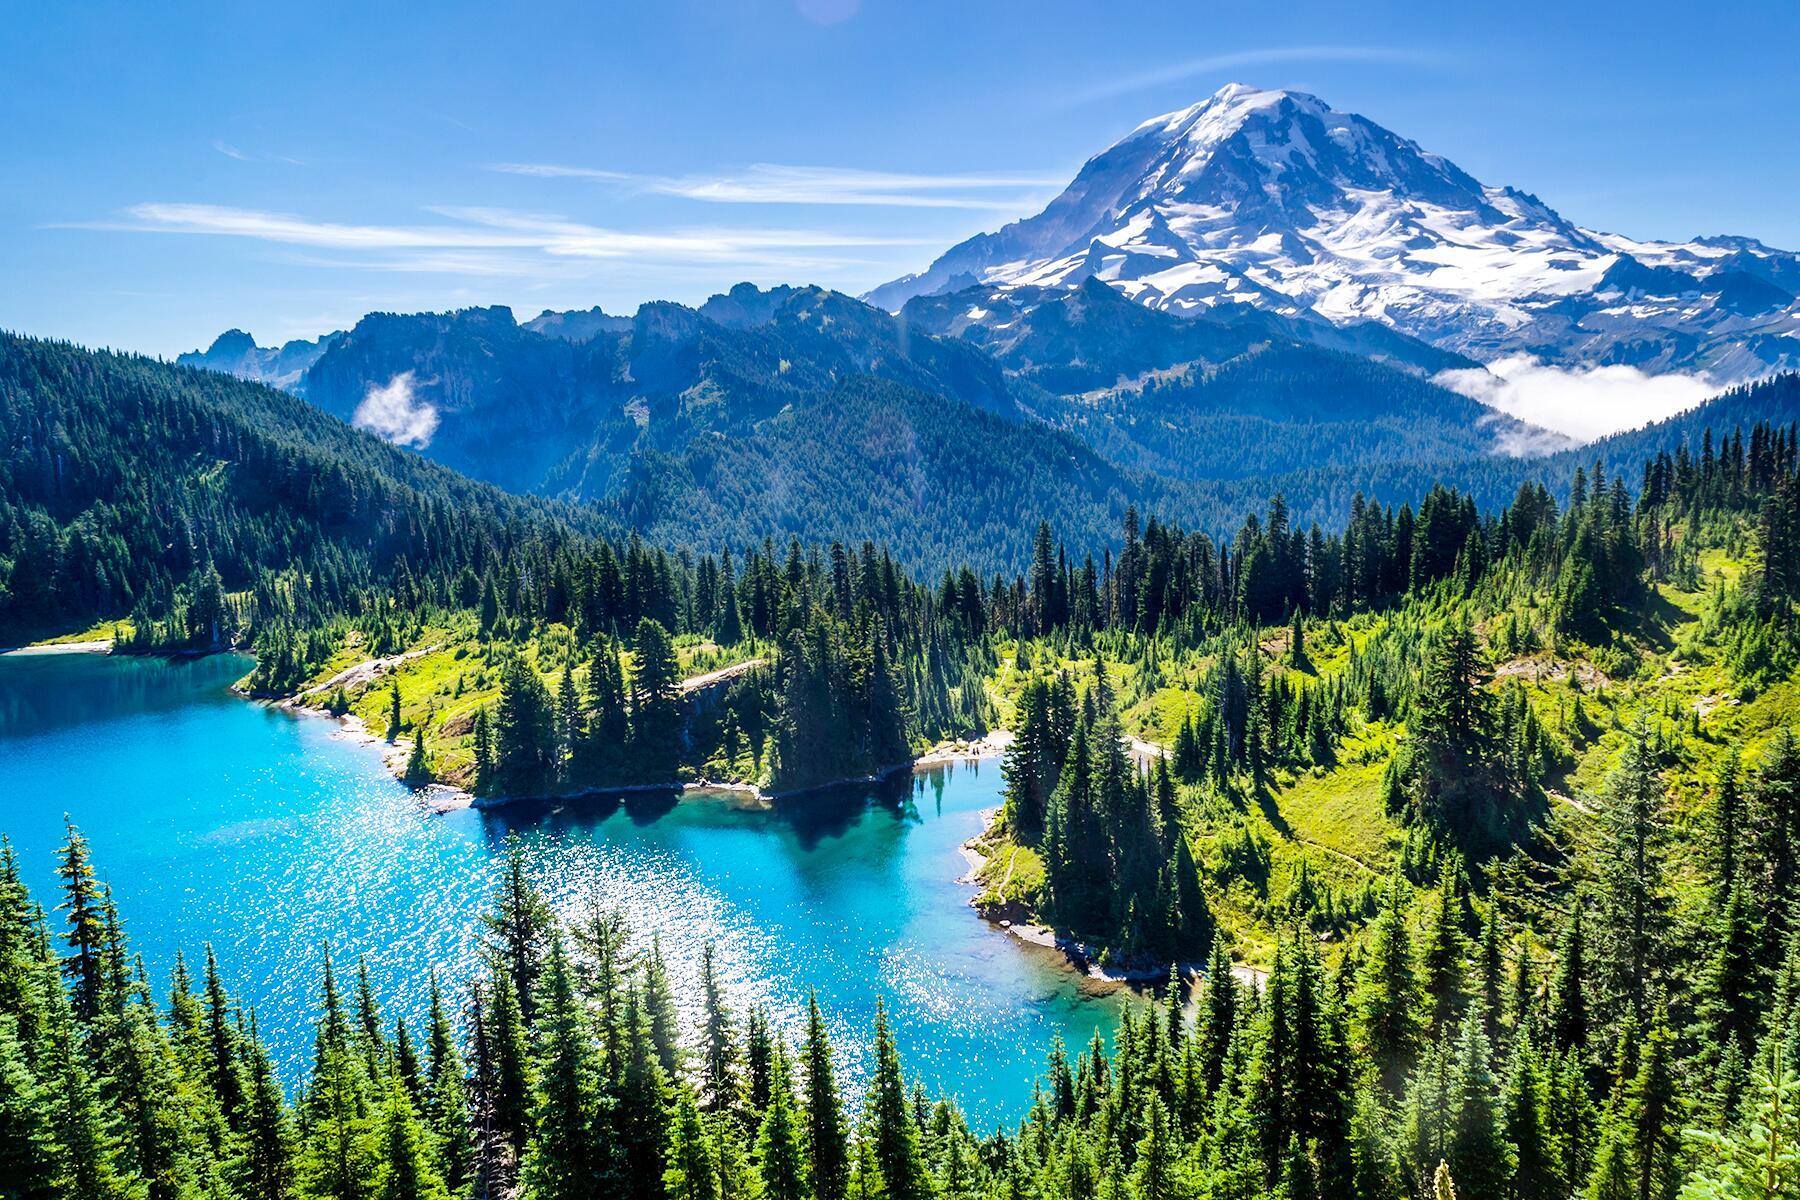 Mt. St. Helens to Mt. Rainier, Washington